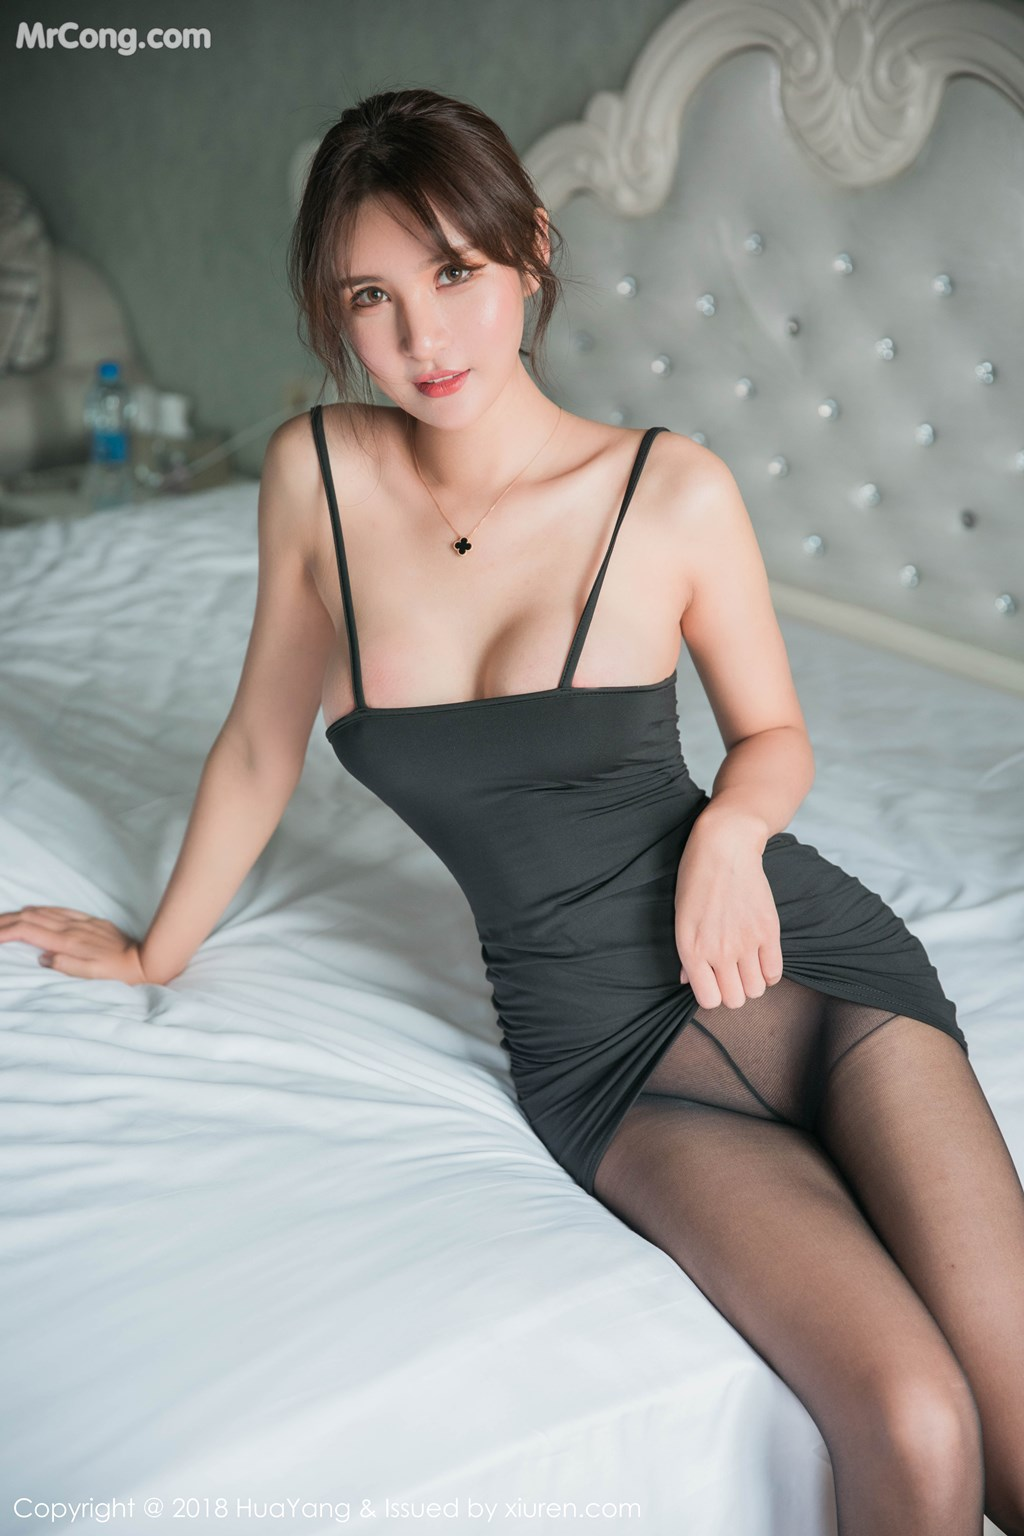 Image HuaYang-2018-11-14-Vol.095-SOLO-MrCong.com-013 in post HuaYang 2018-11-14 Vol.095: Người mẫu SOLO-尹菲 (46 ảnh)